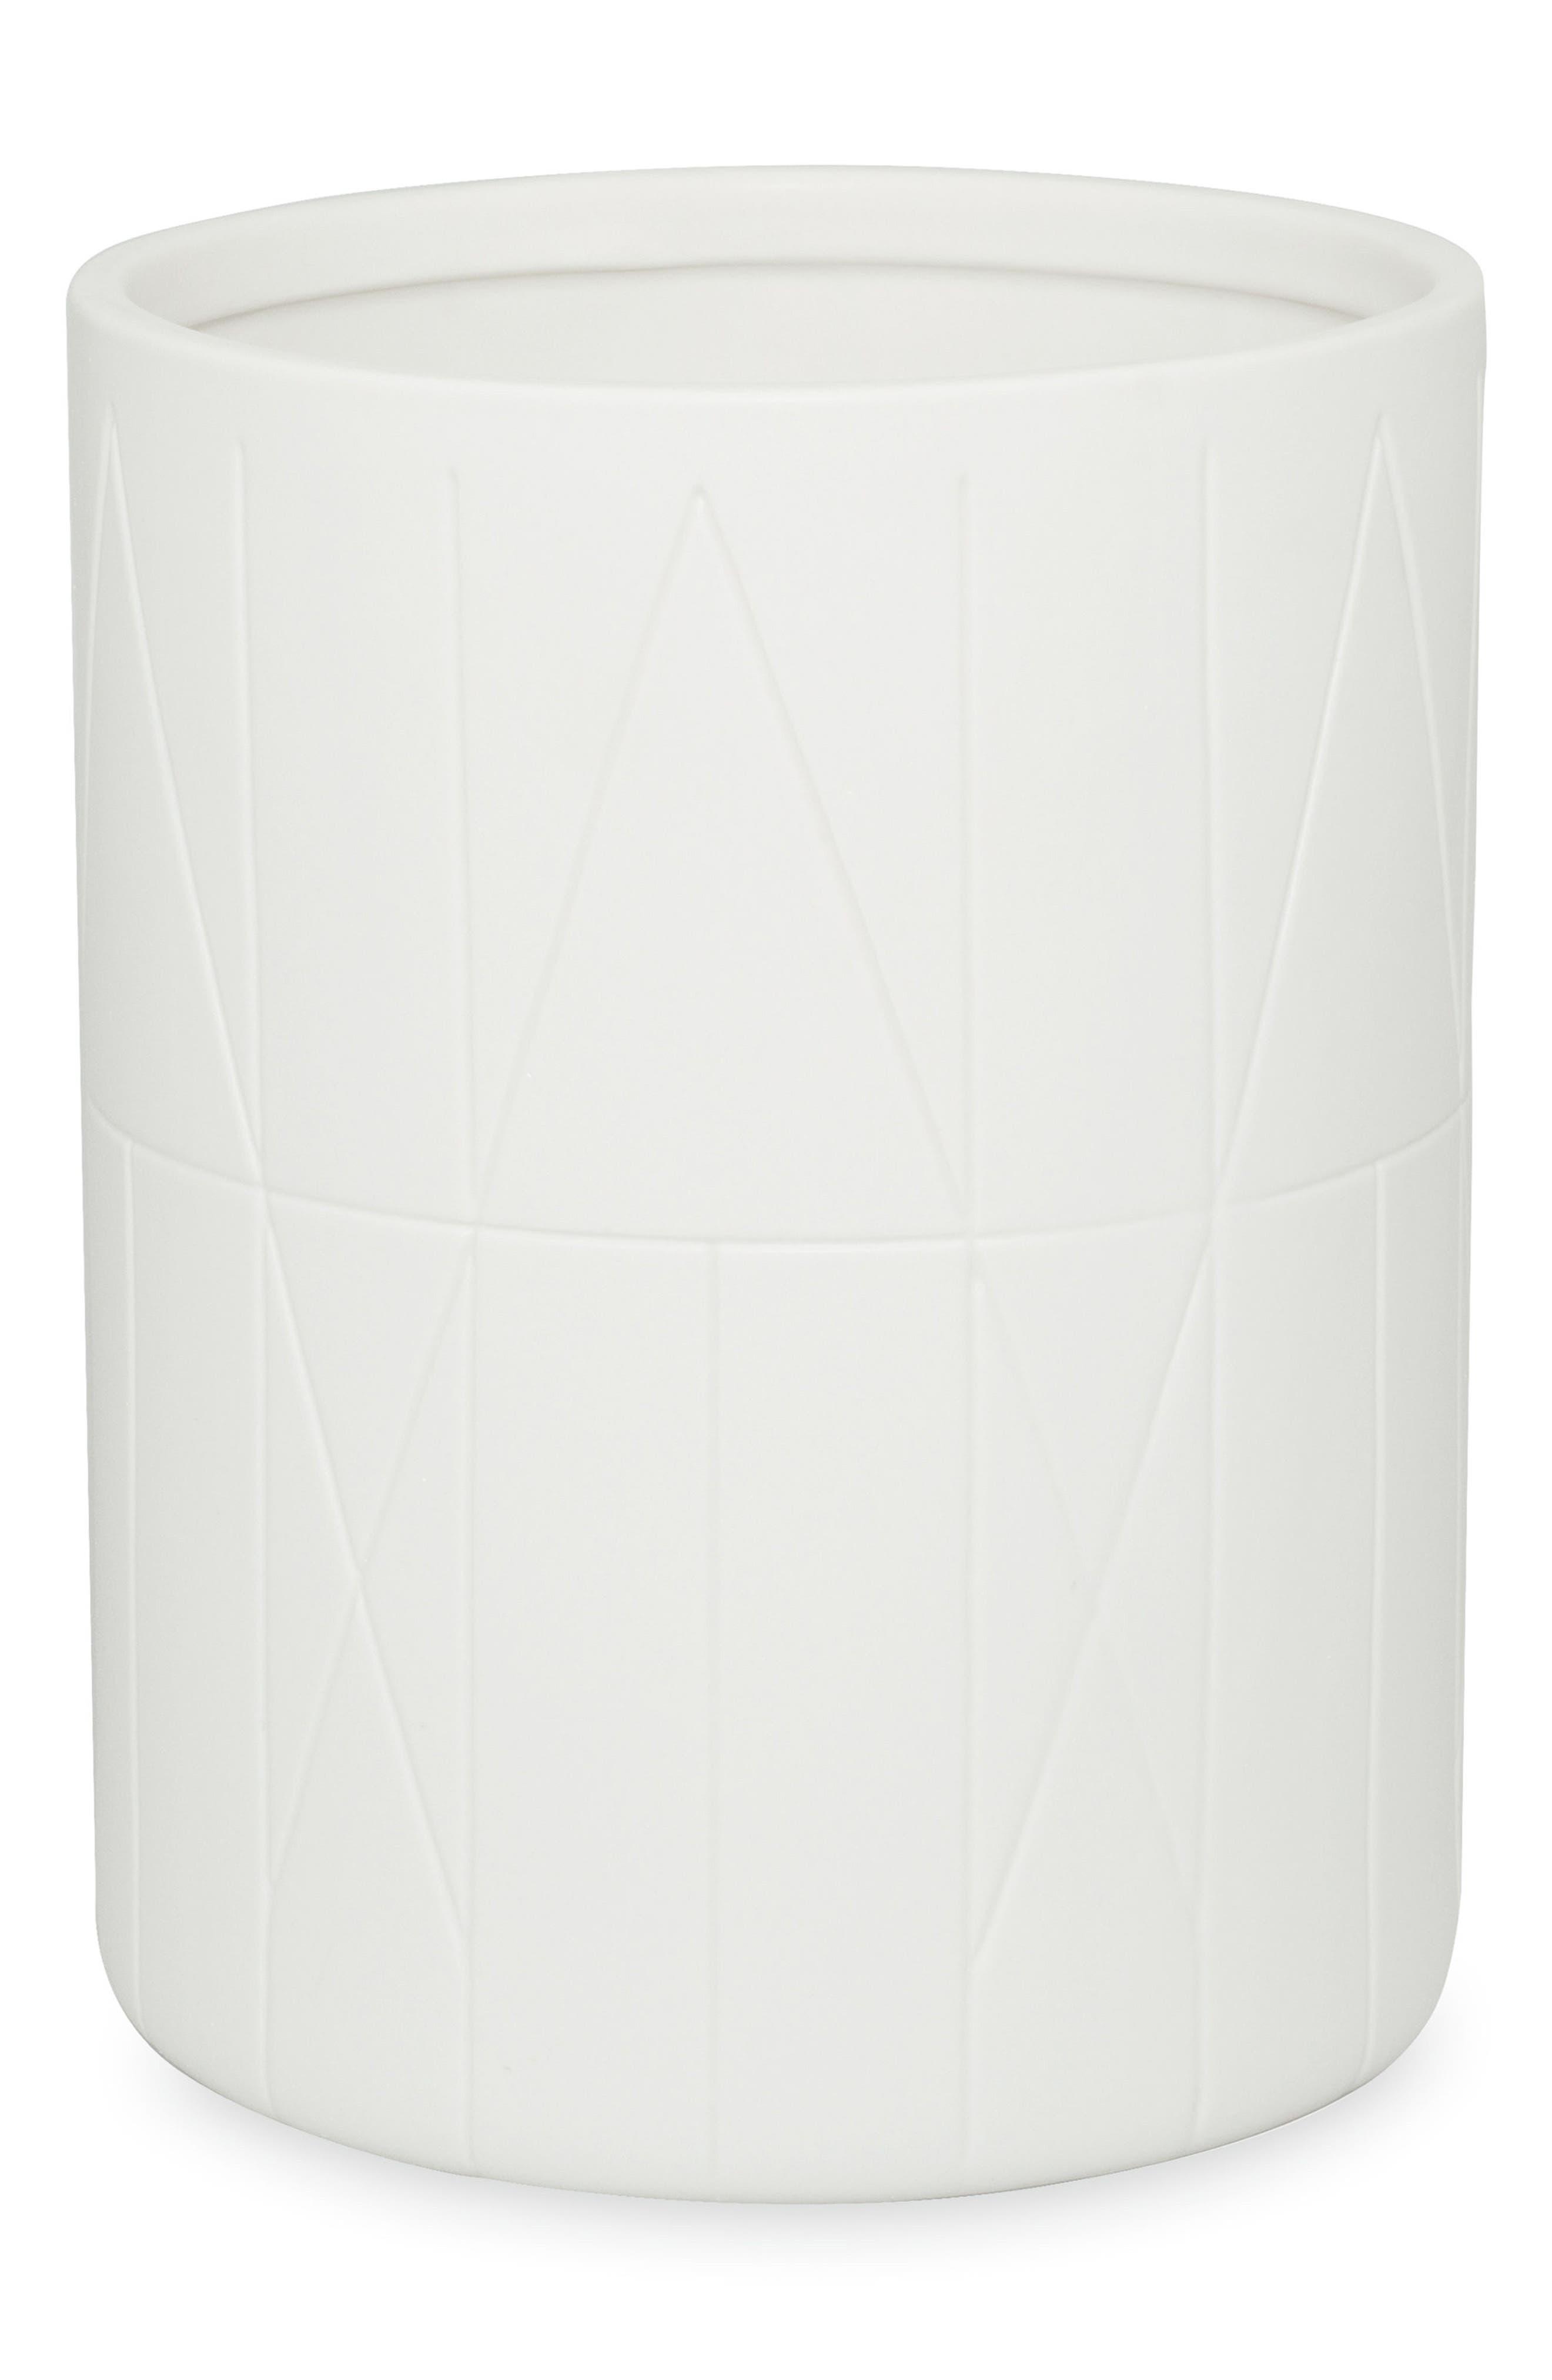 Main Image - DKNY Geometrix Waste Basket